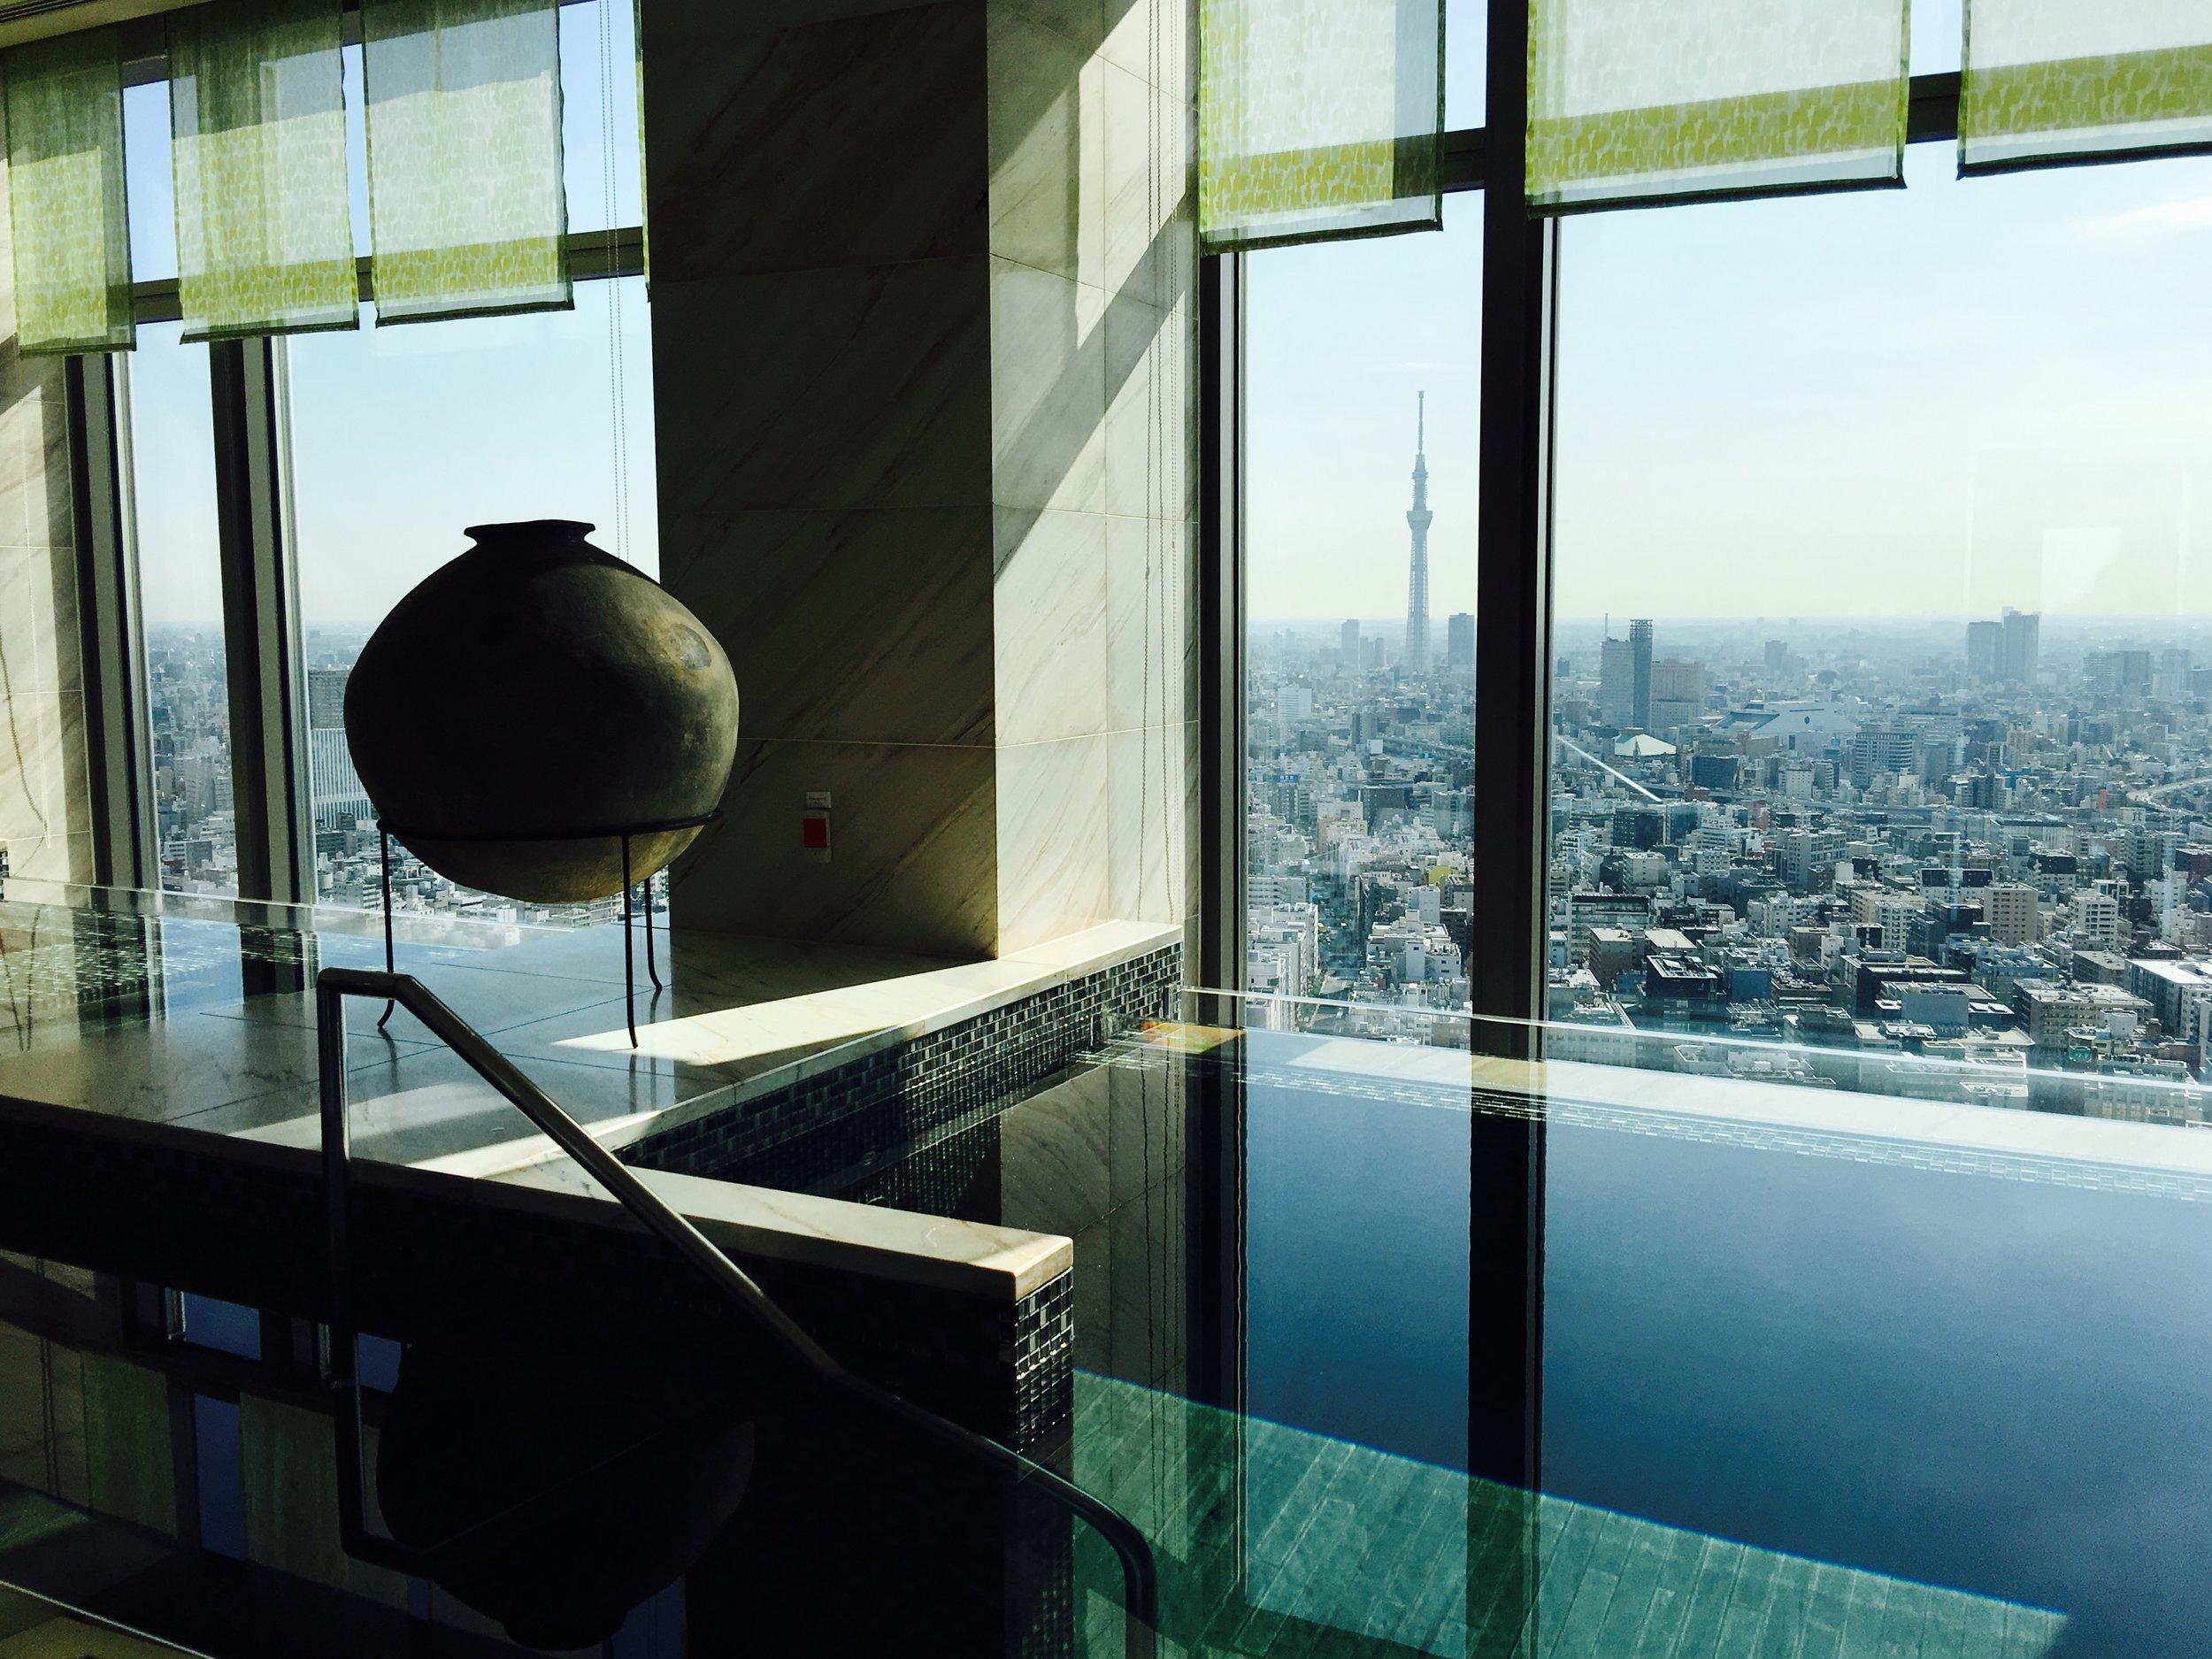 Mandarin Oriental Hotel Spa, Tokyo. Credit: Angie Davis.